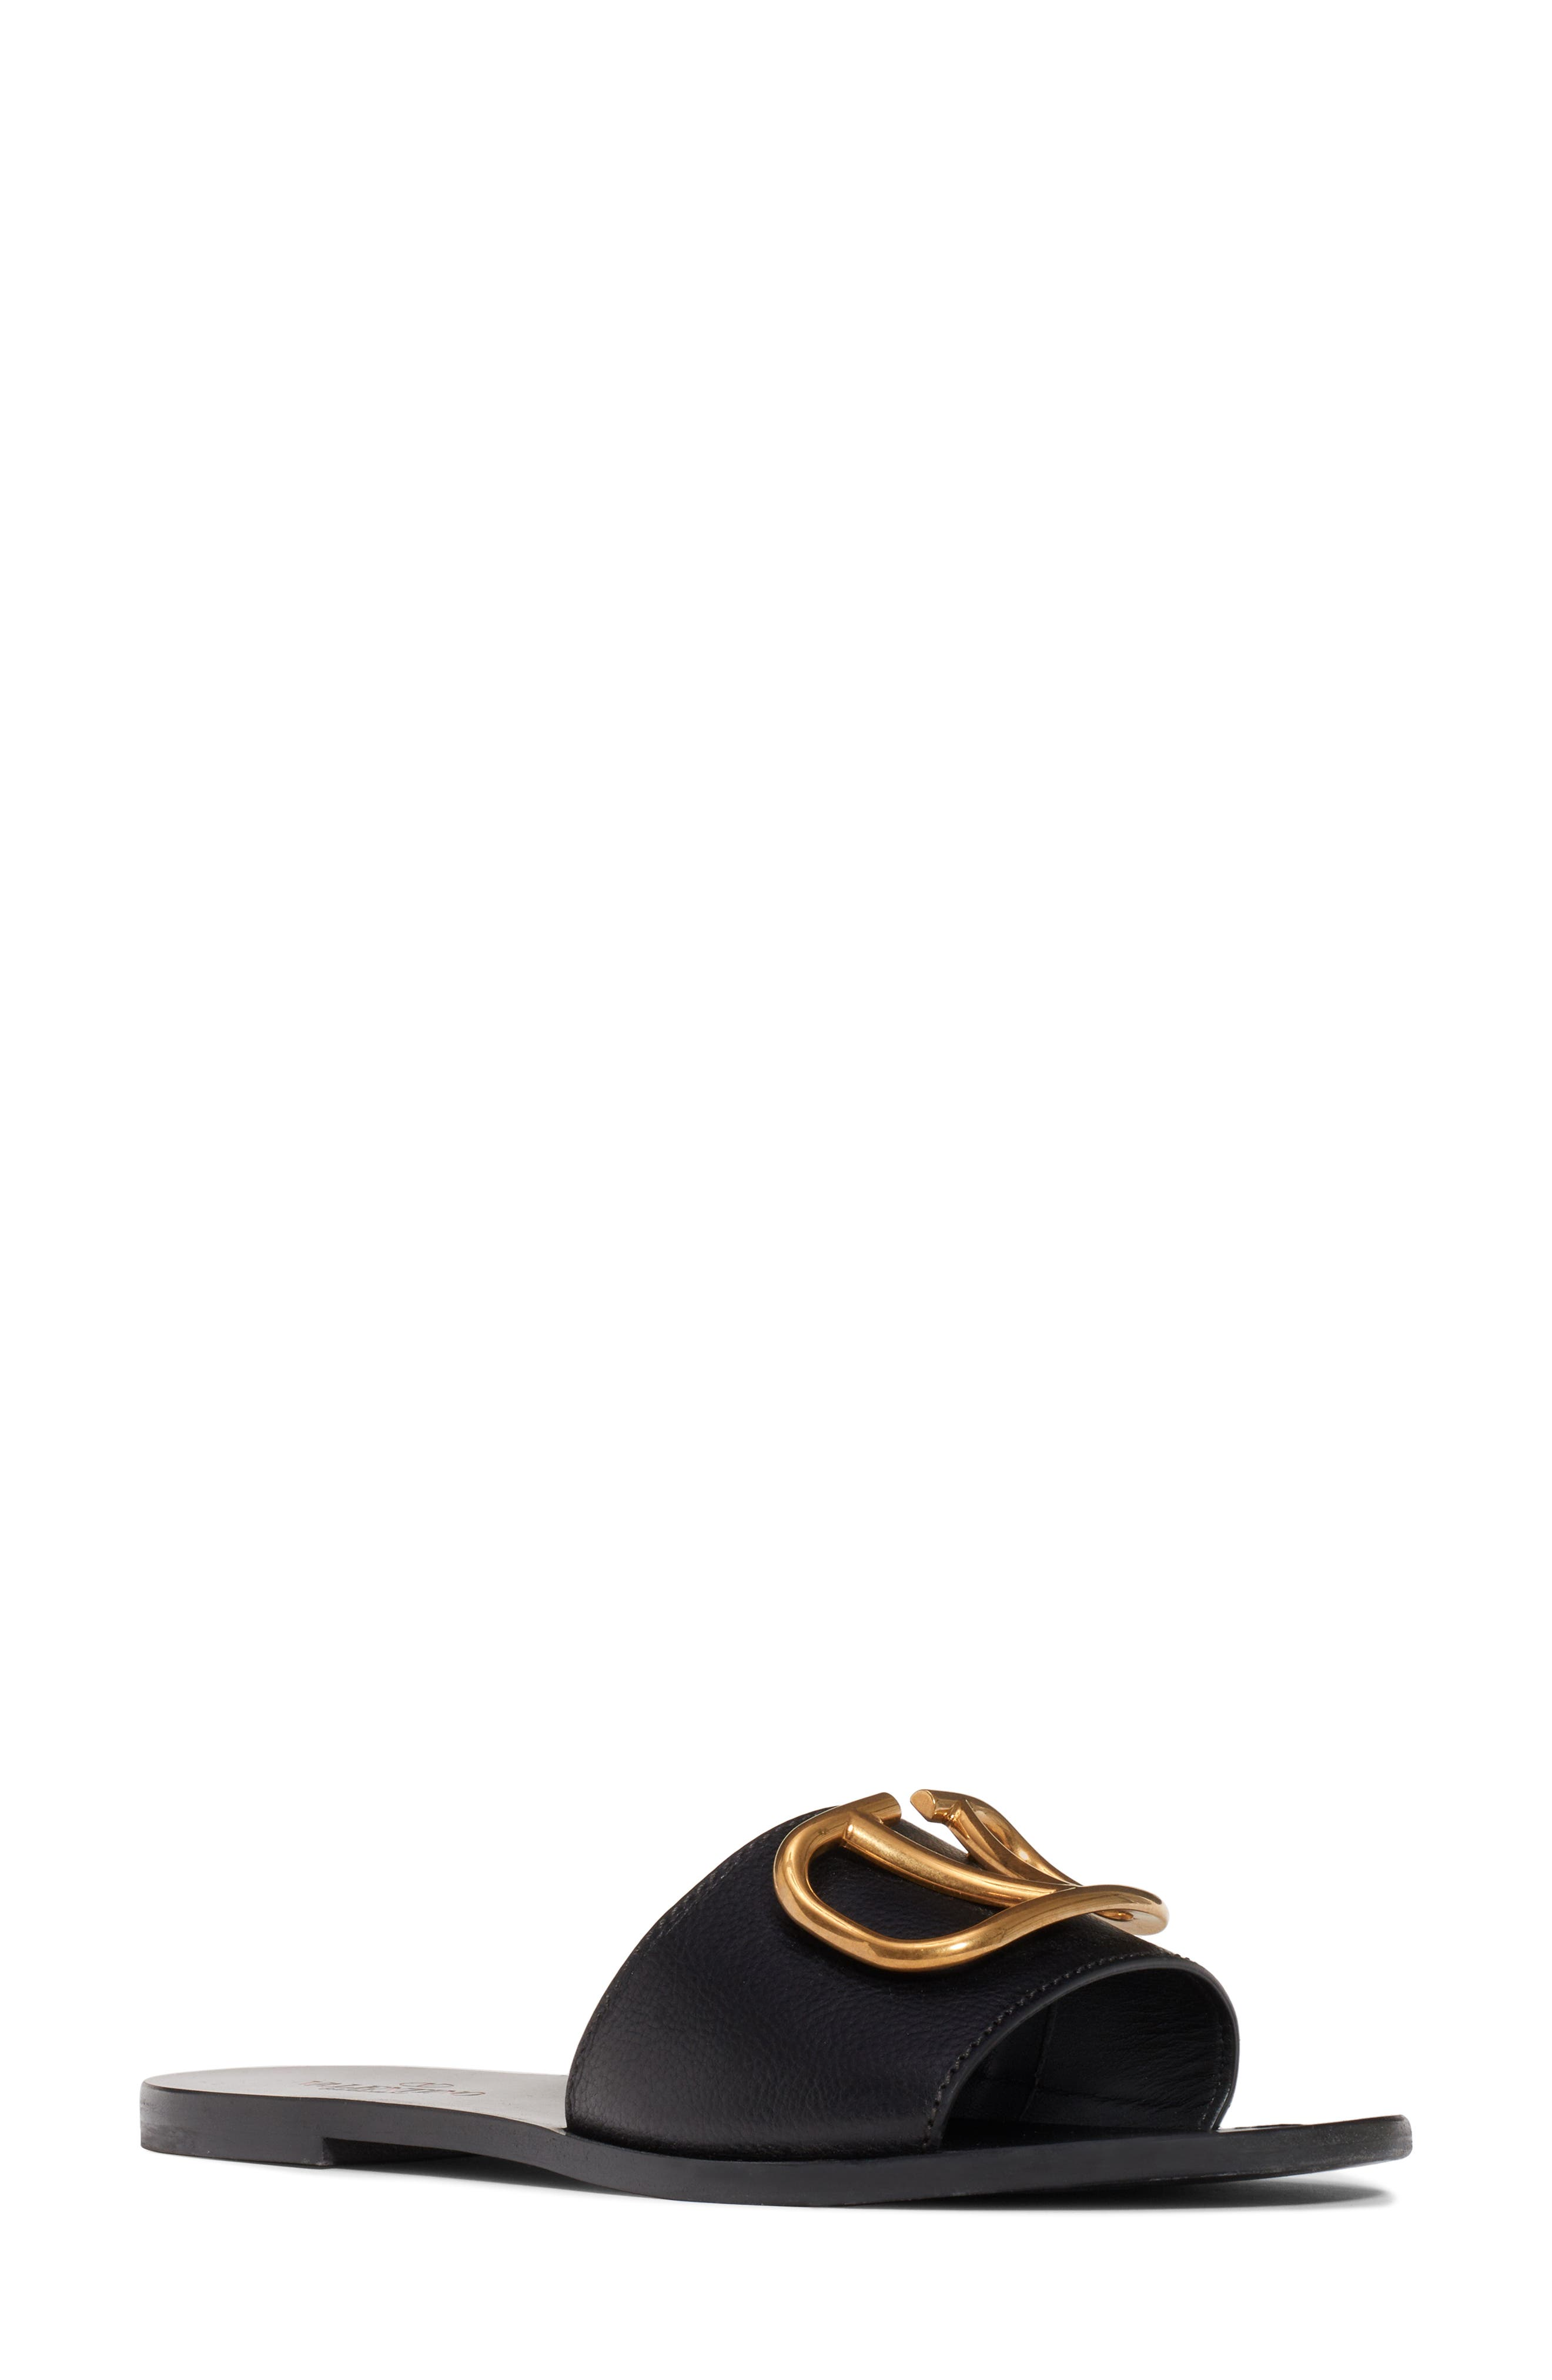 VALENTINO GARAVANI Brooch Slide Sandal, Main, color, BLACK